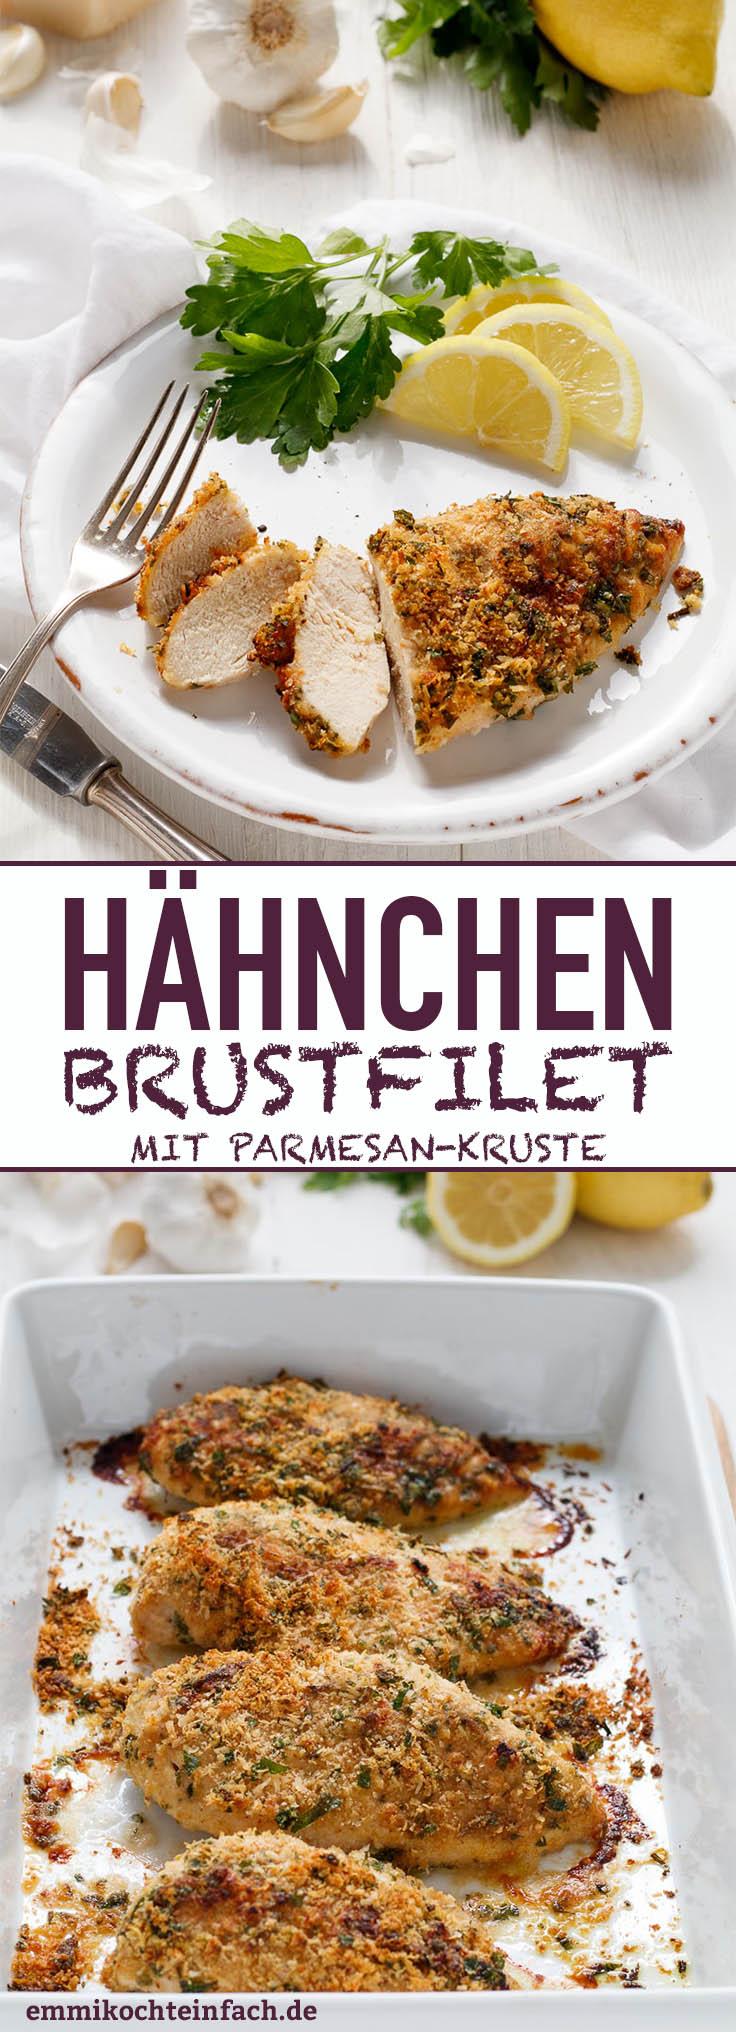 Hähnchenbrustfilet mit Parmesankruste - www.emmikochteinfach.de